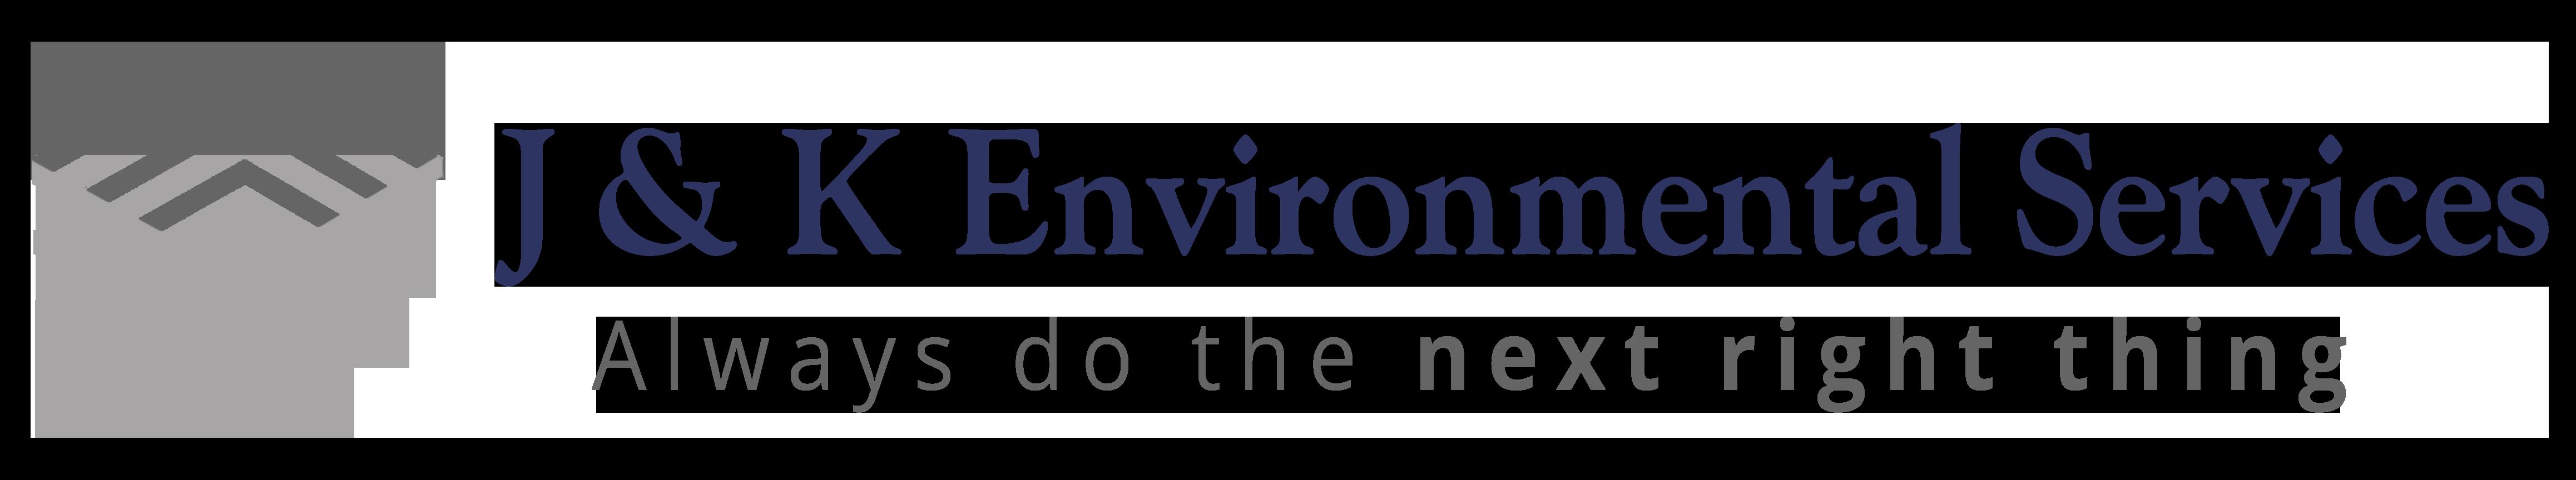 J & K Environmental Services